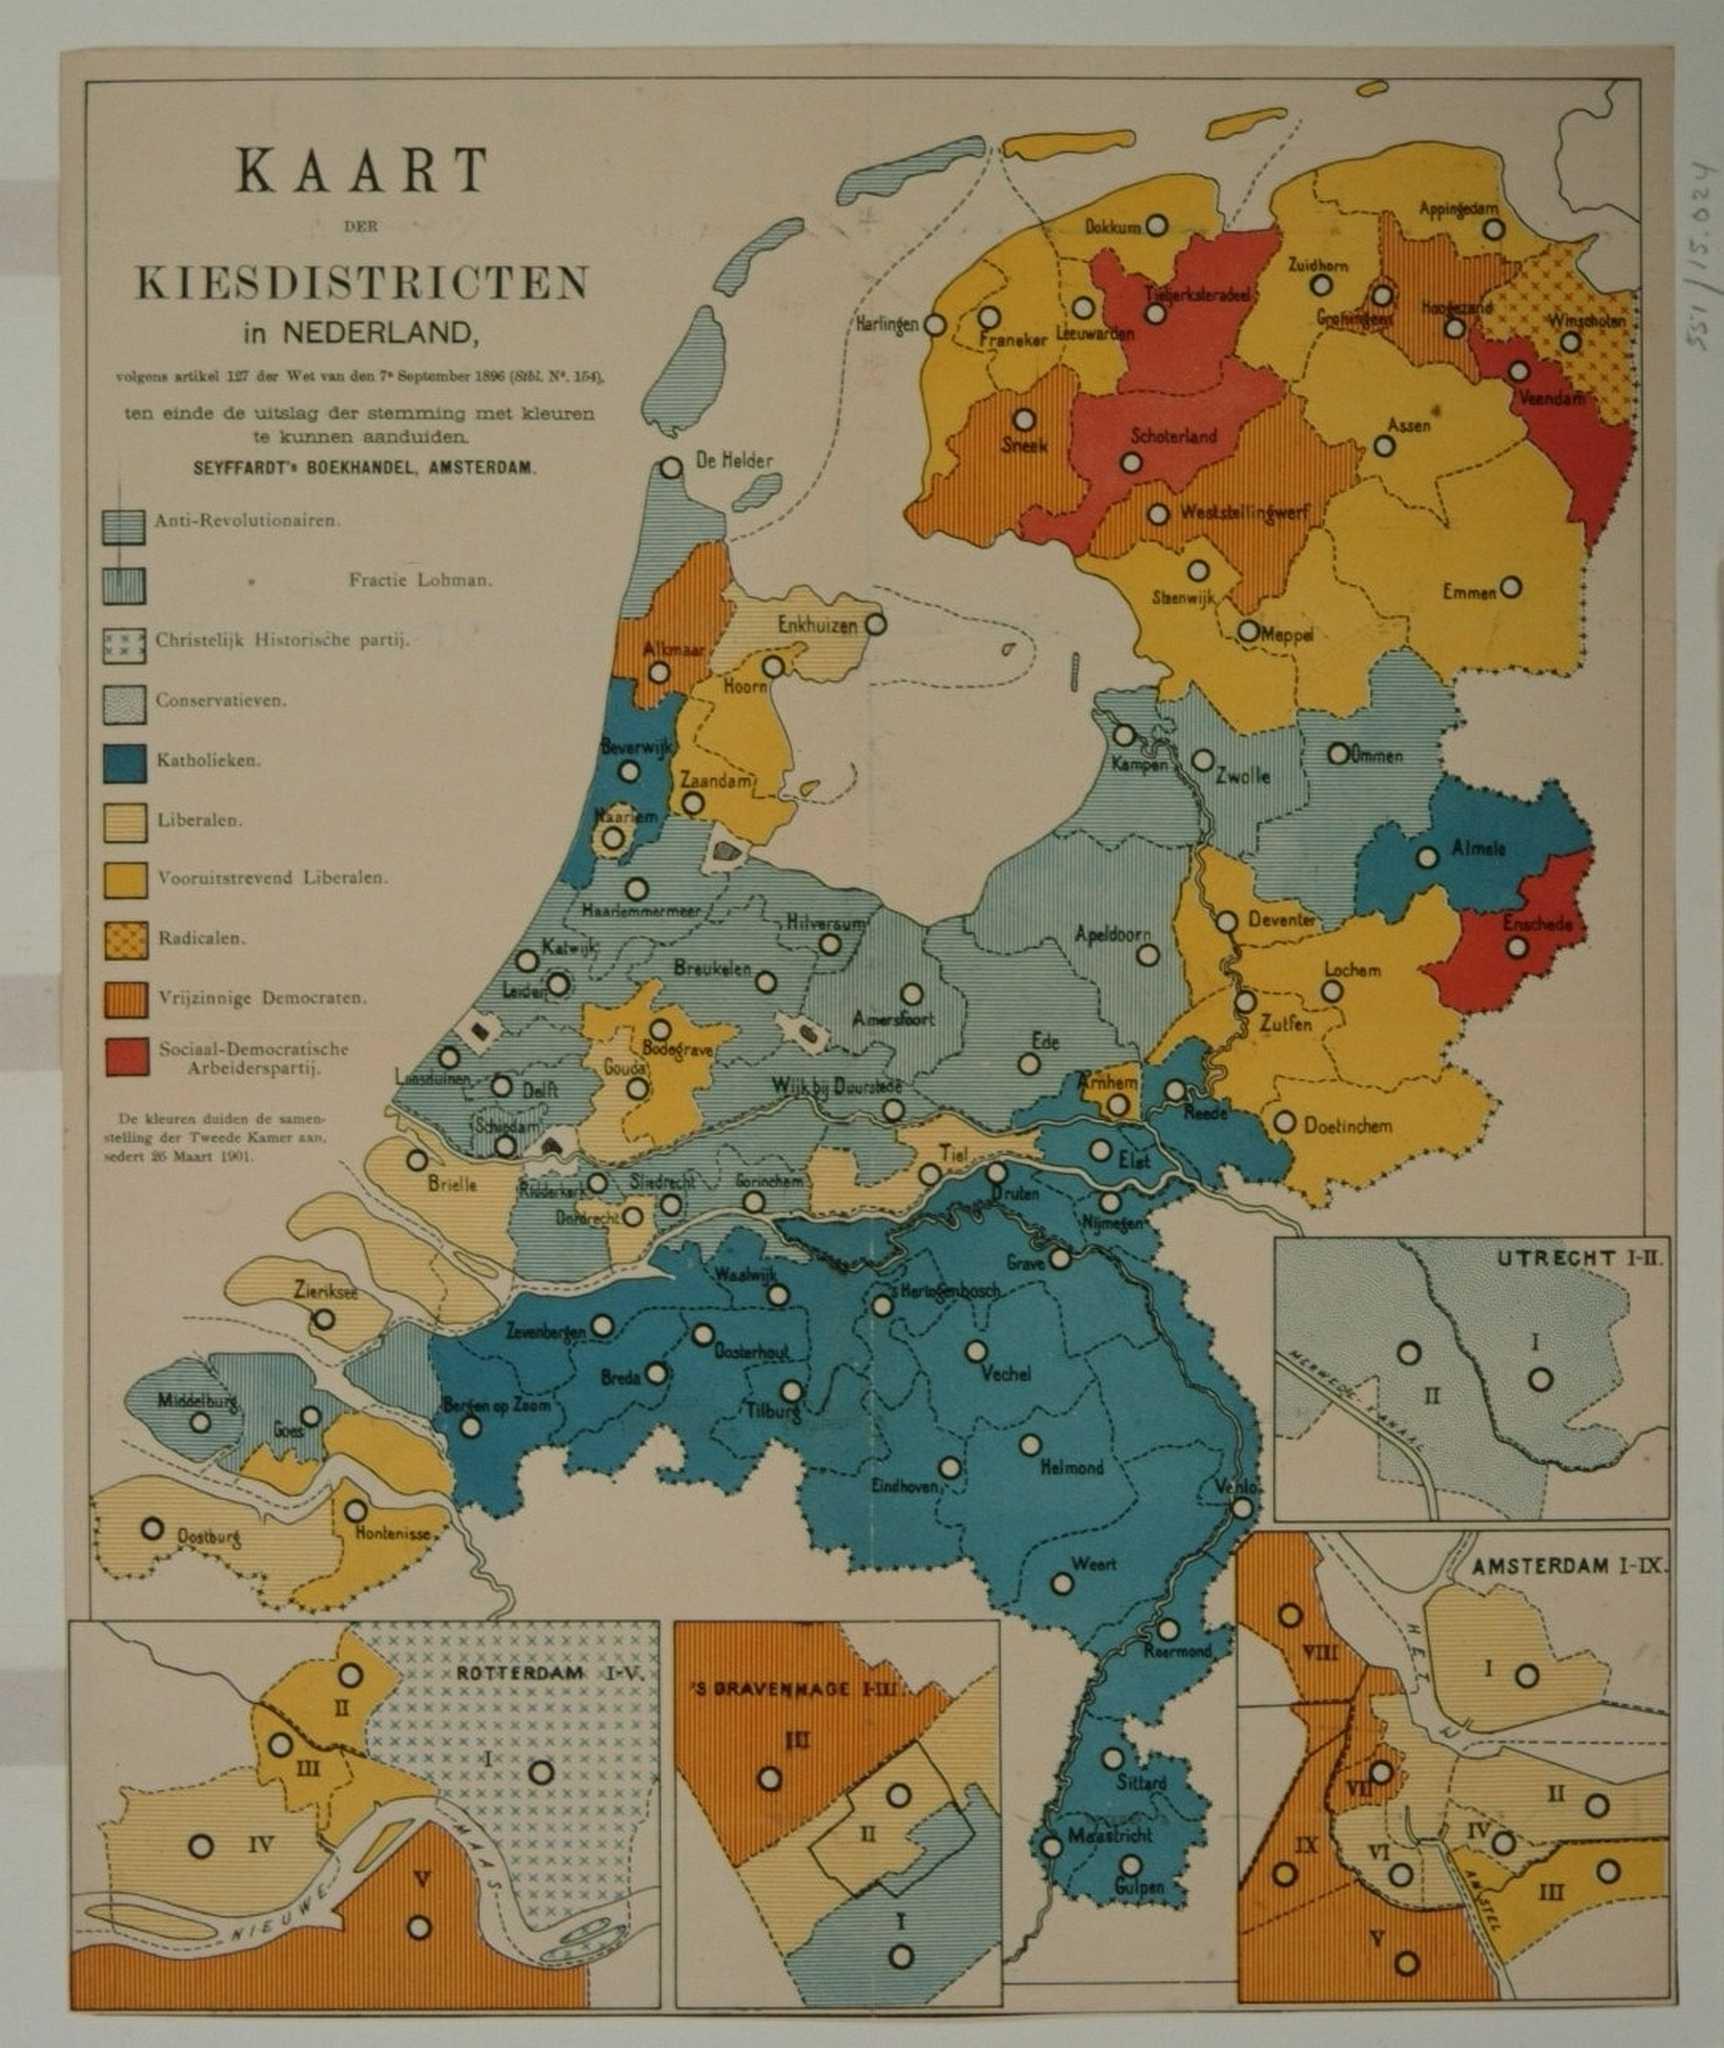 NL Kiesdistrikten 1886-1917.jpg